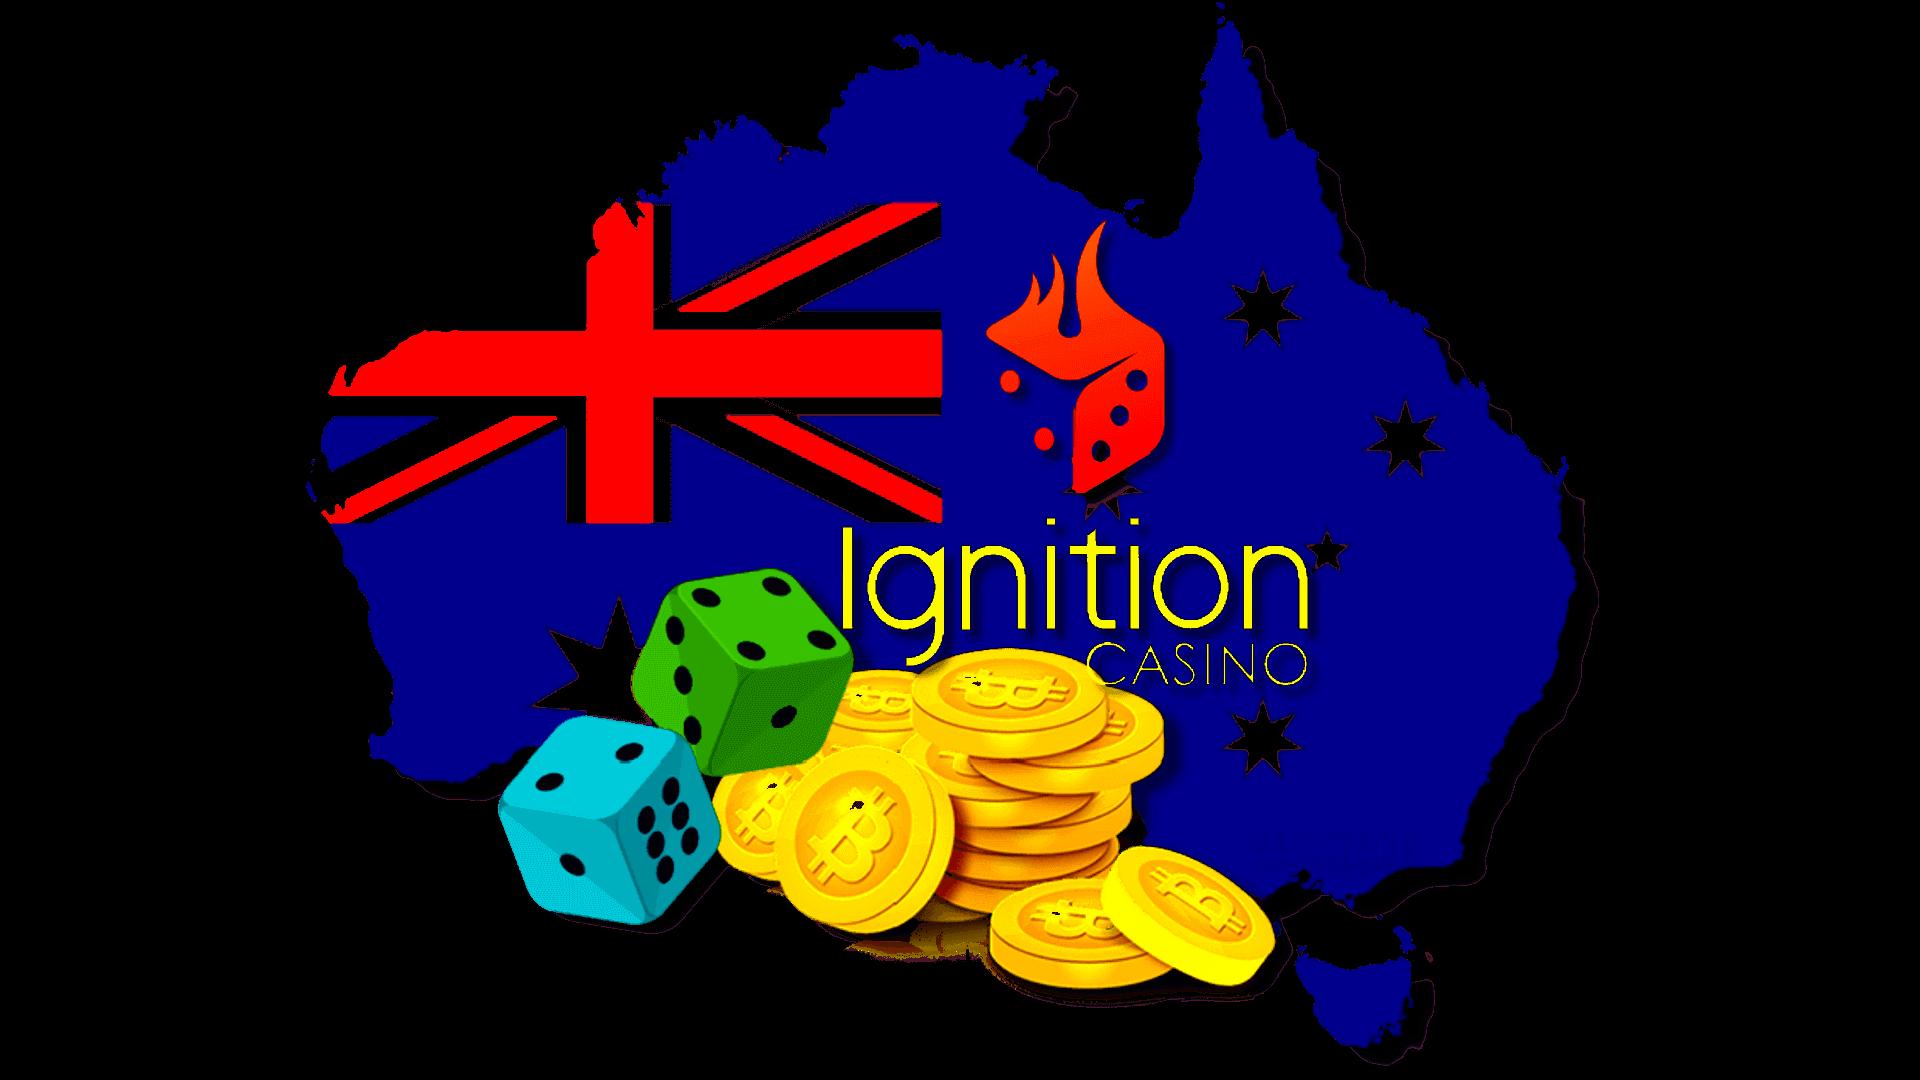 Ignition Casino Bitcoin Gambling Real Money